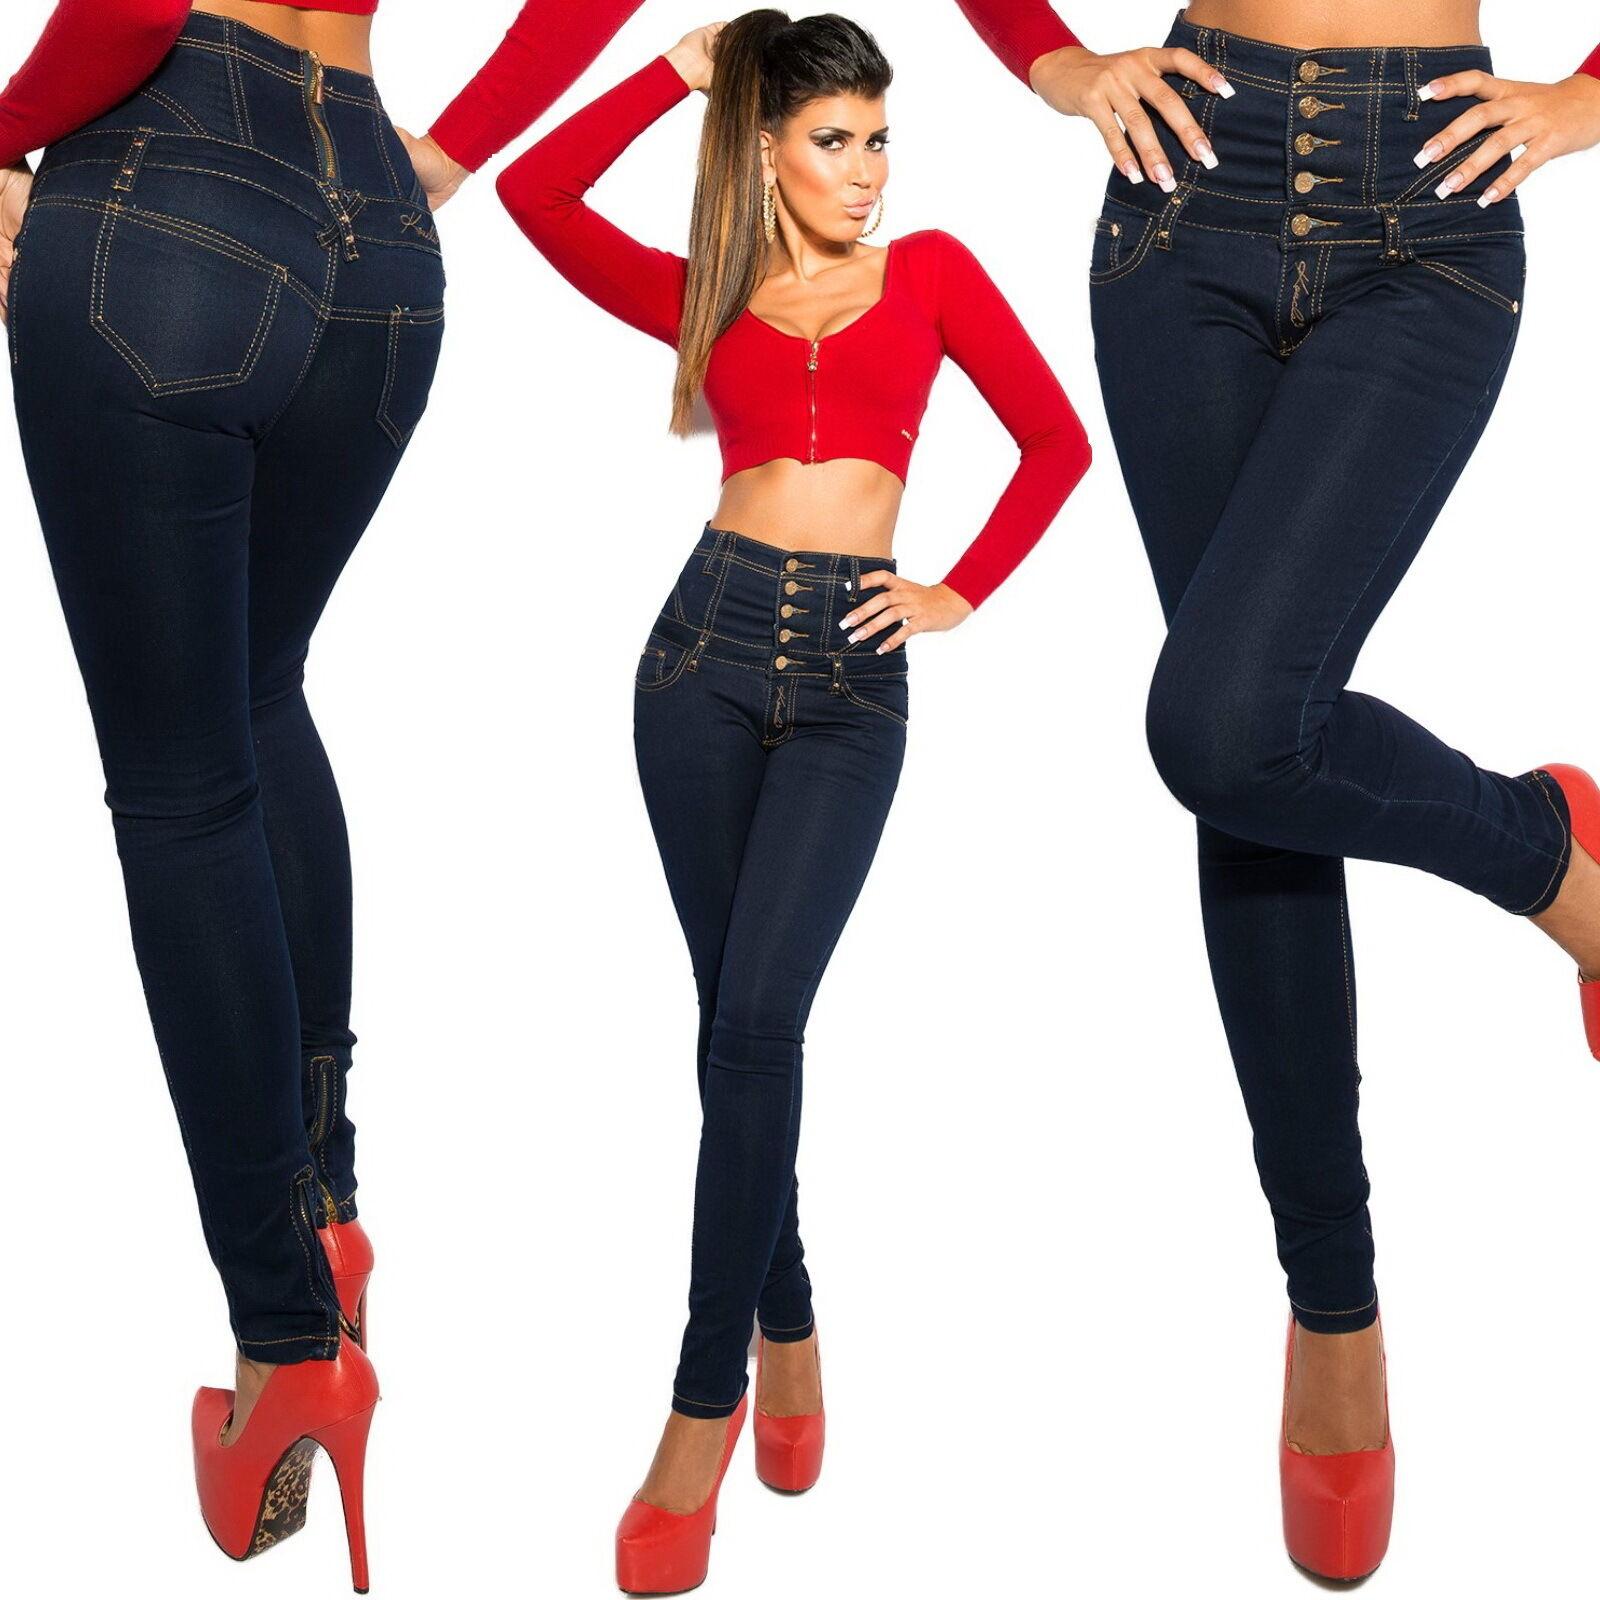 Women's High Waist Ankle Zip Slim Skinny Denim Jeans - XS S M L XL